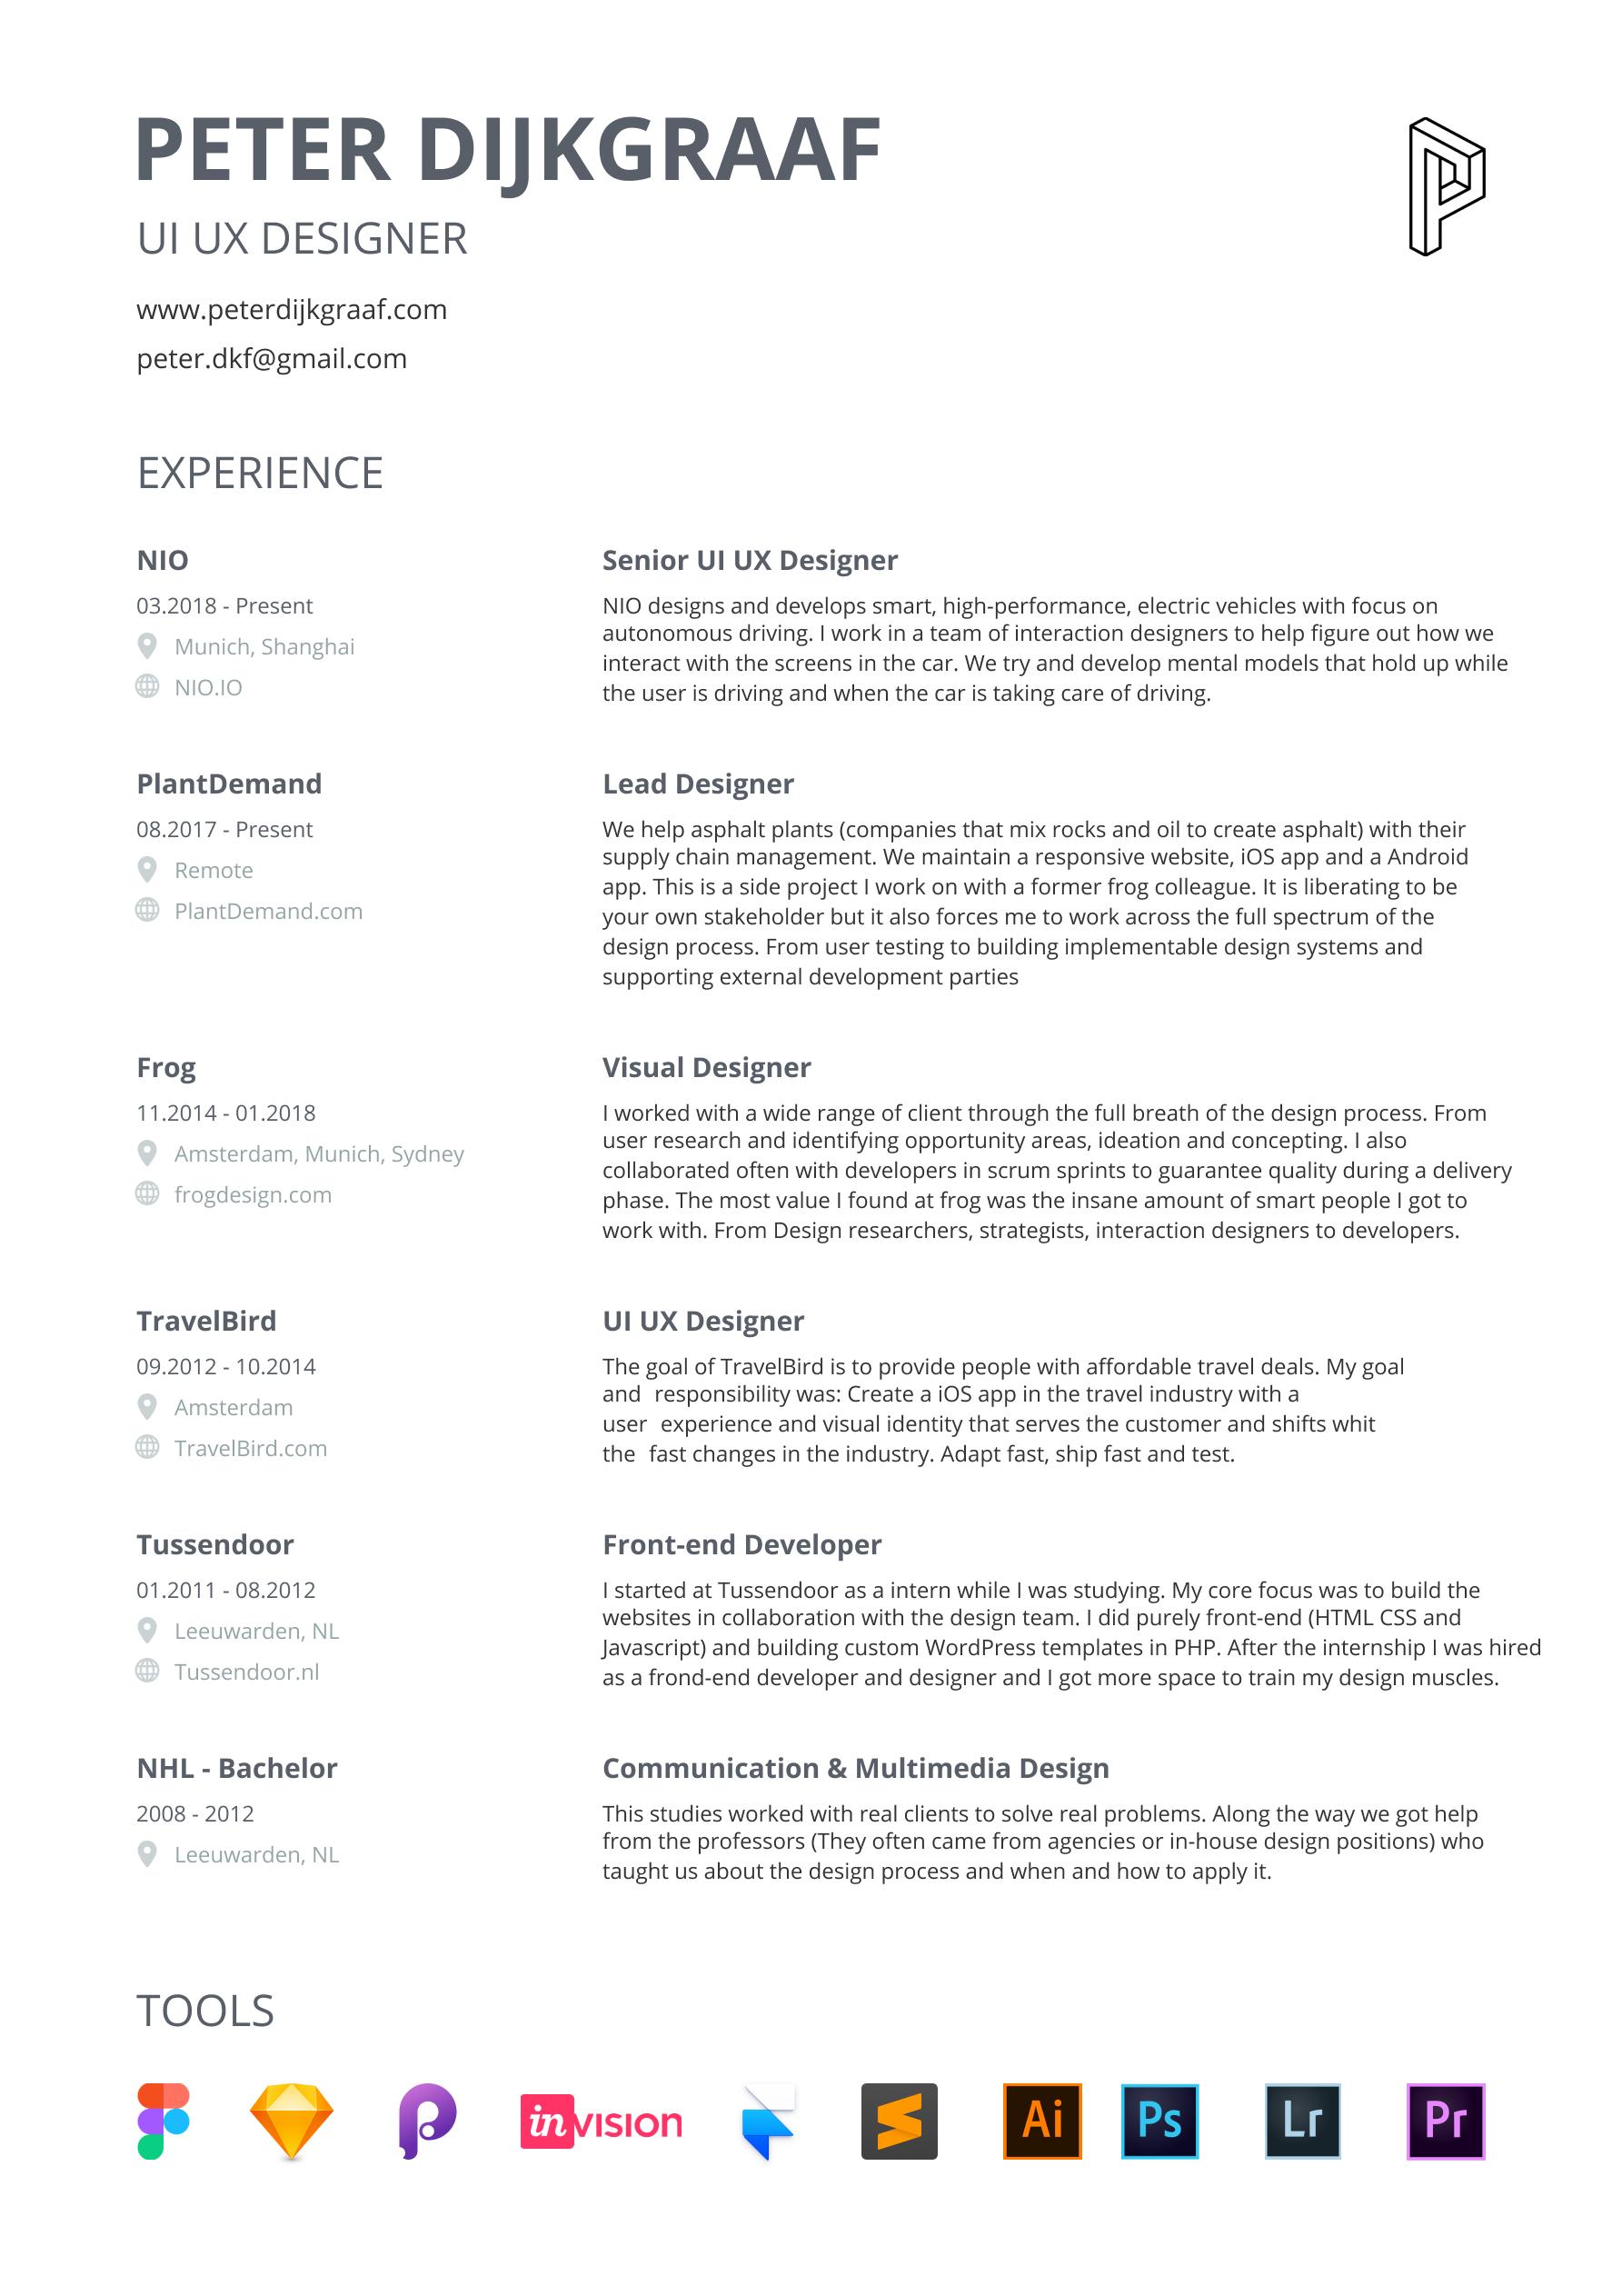 resume CV Peter Dijkgraaf